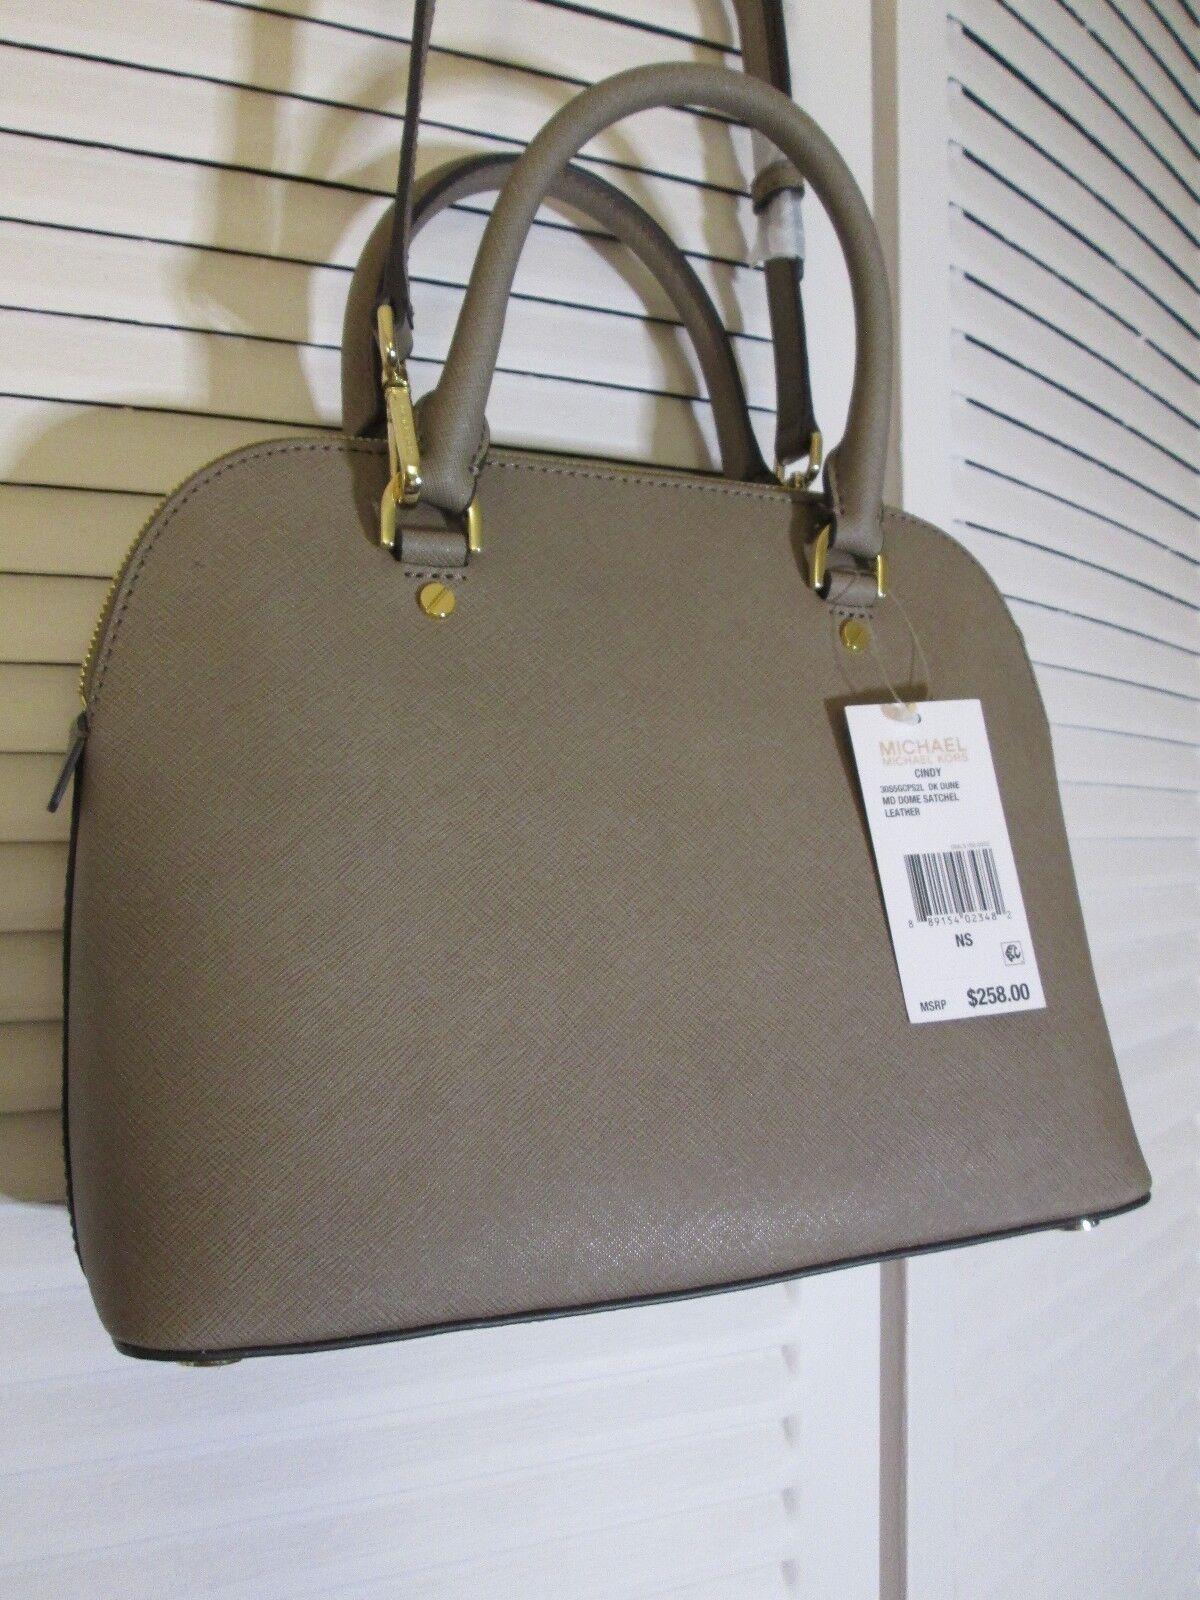 09374ec650 Michael Kors Cindy Medium Dome Satchel Saffiano Leather Dark Dune Gold H1  for sale online